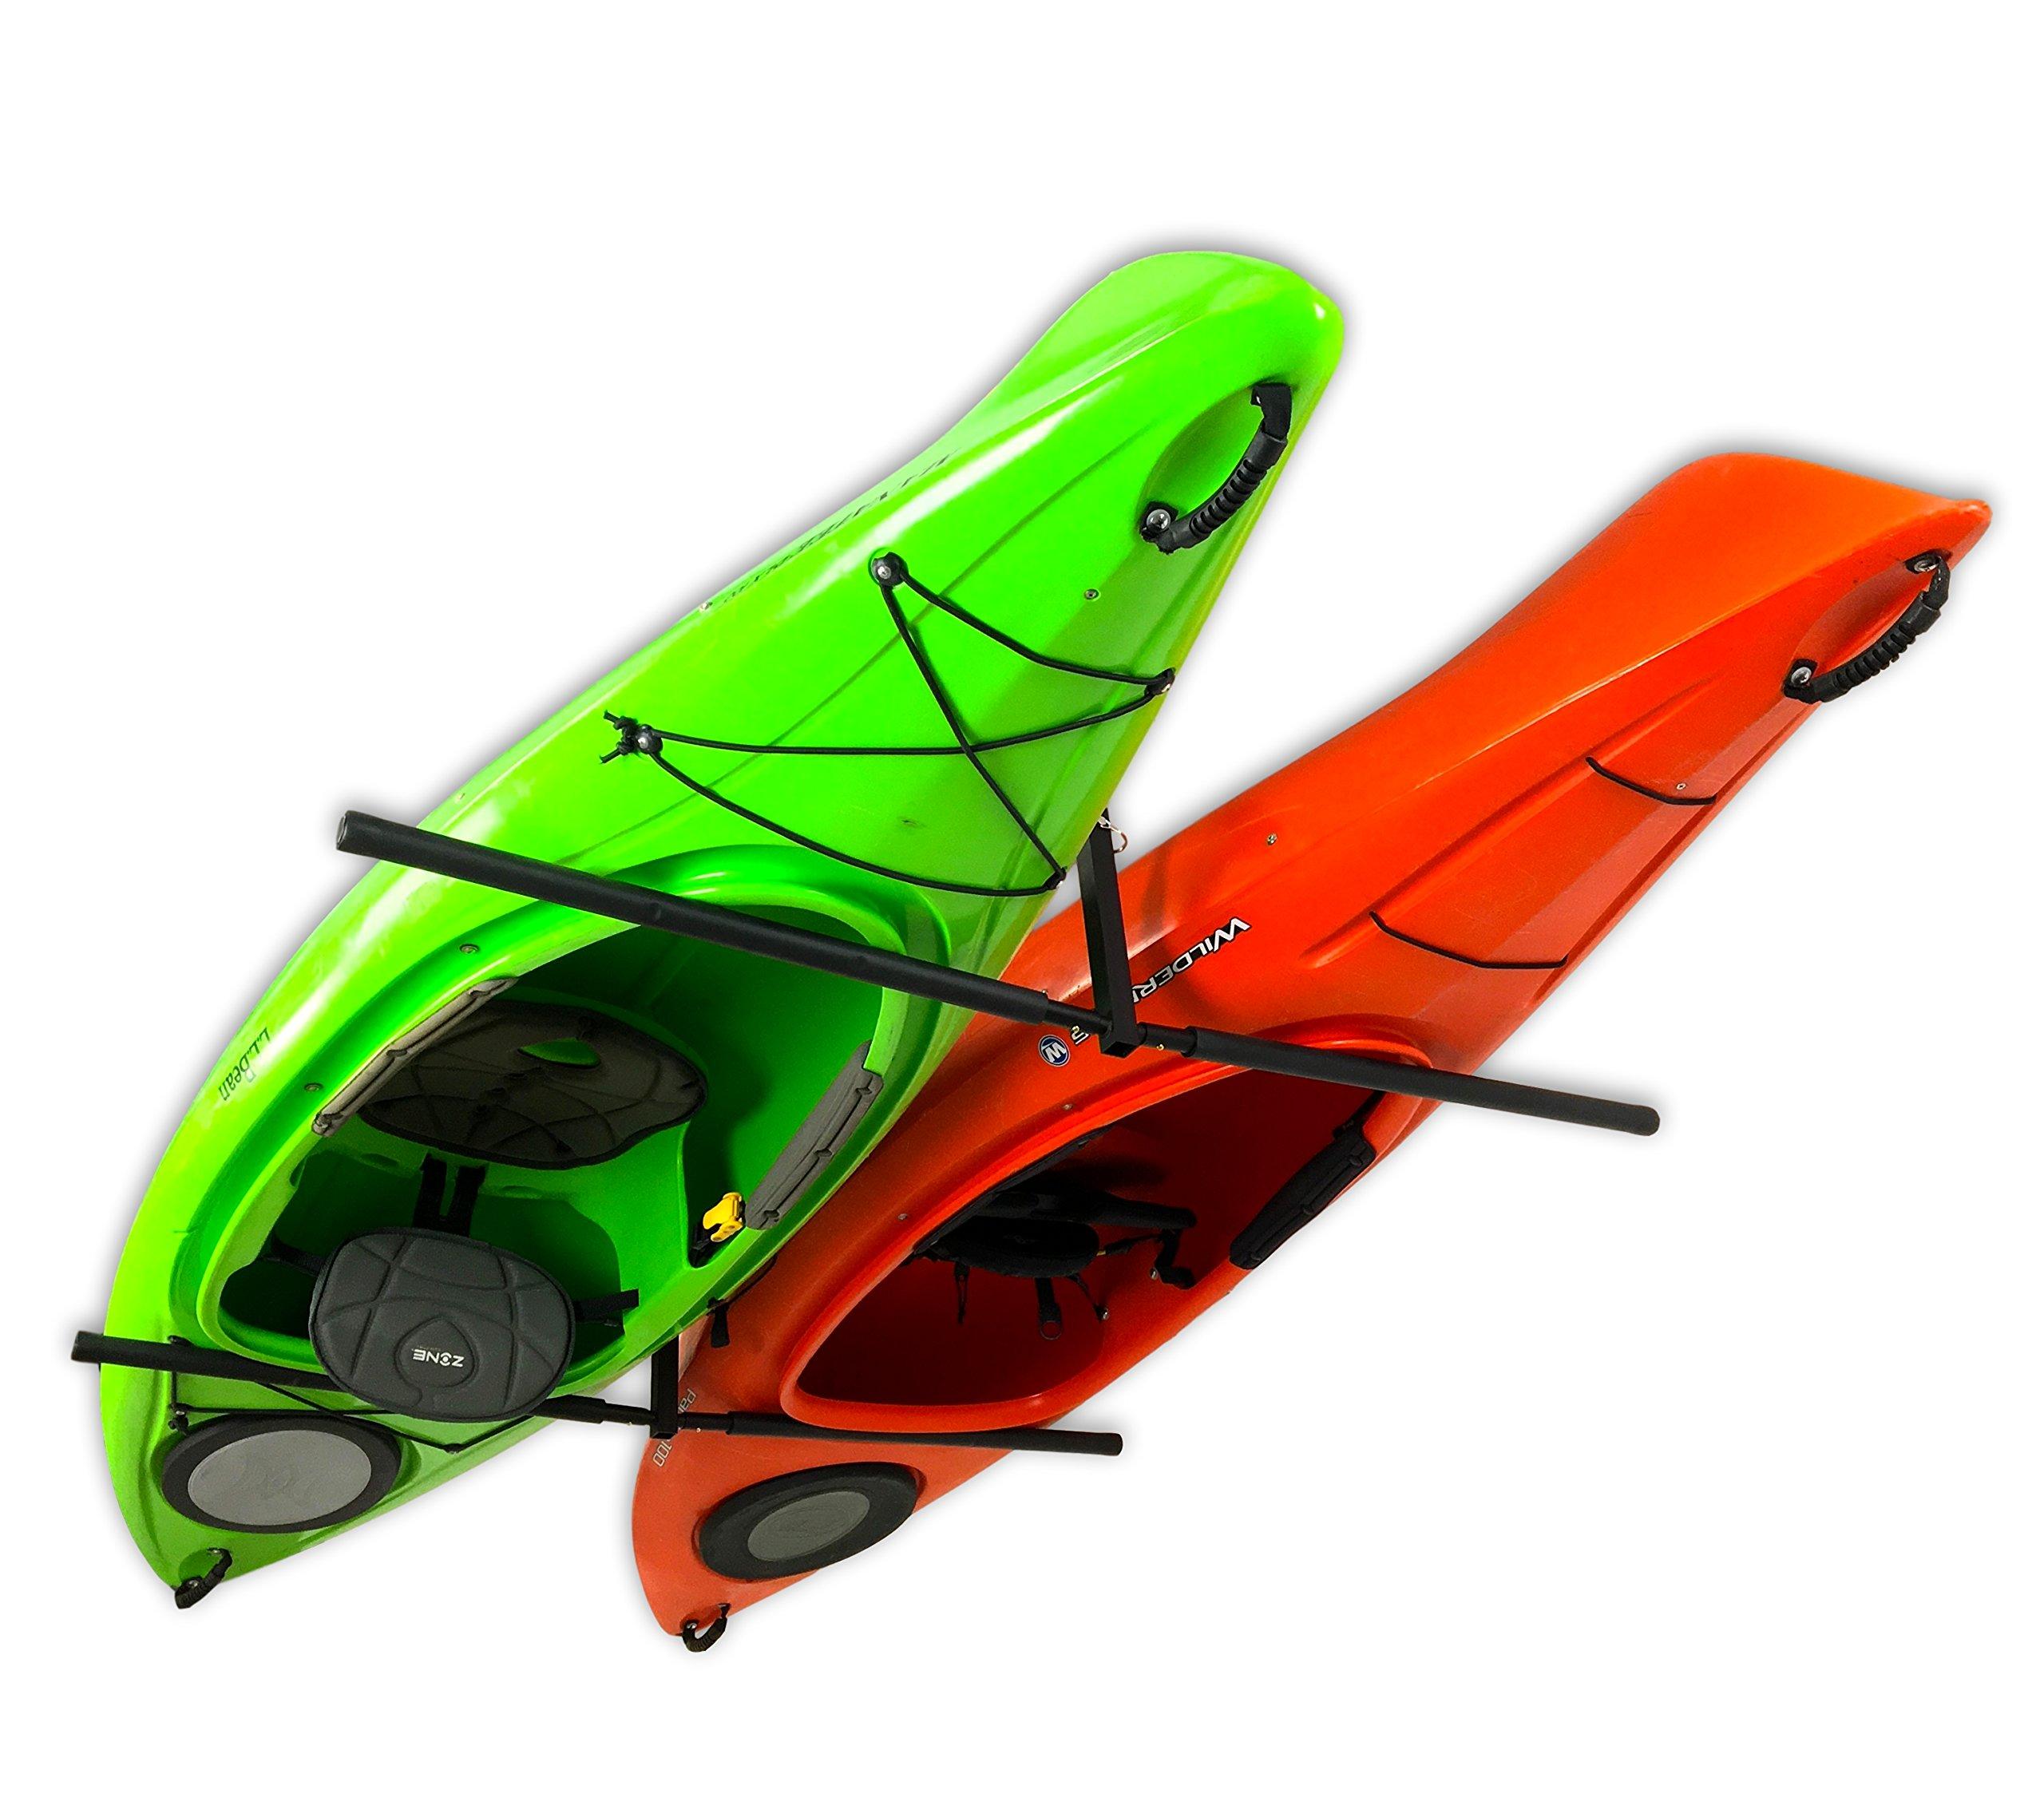 StoreYourBoard 2 Kayak Ceiling Rack, Hi Port 2 Storage Hanger Overhead Mount, Adjustable, Extra Large 30 Inch Arms by StoreYourBoard